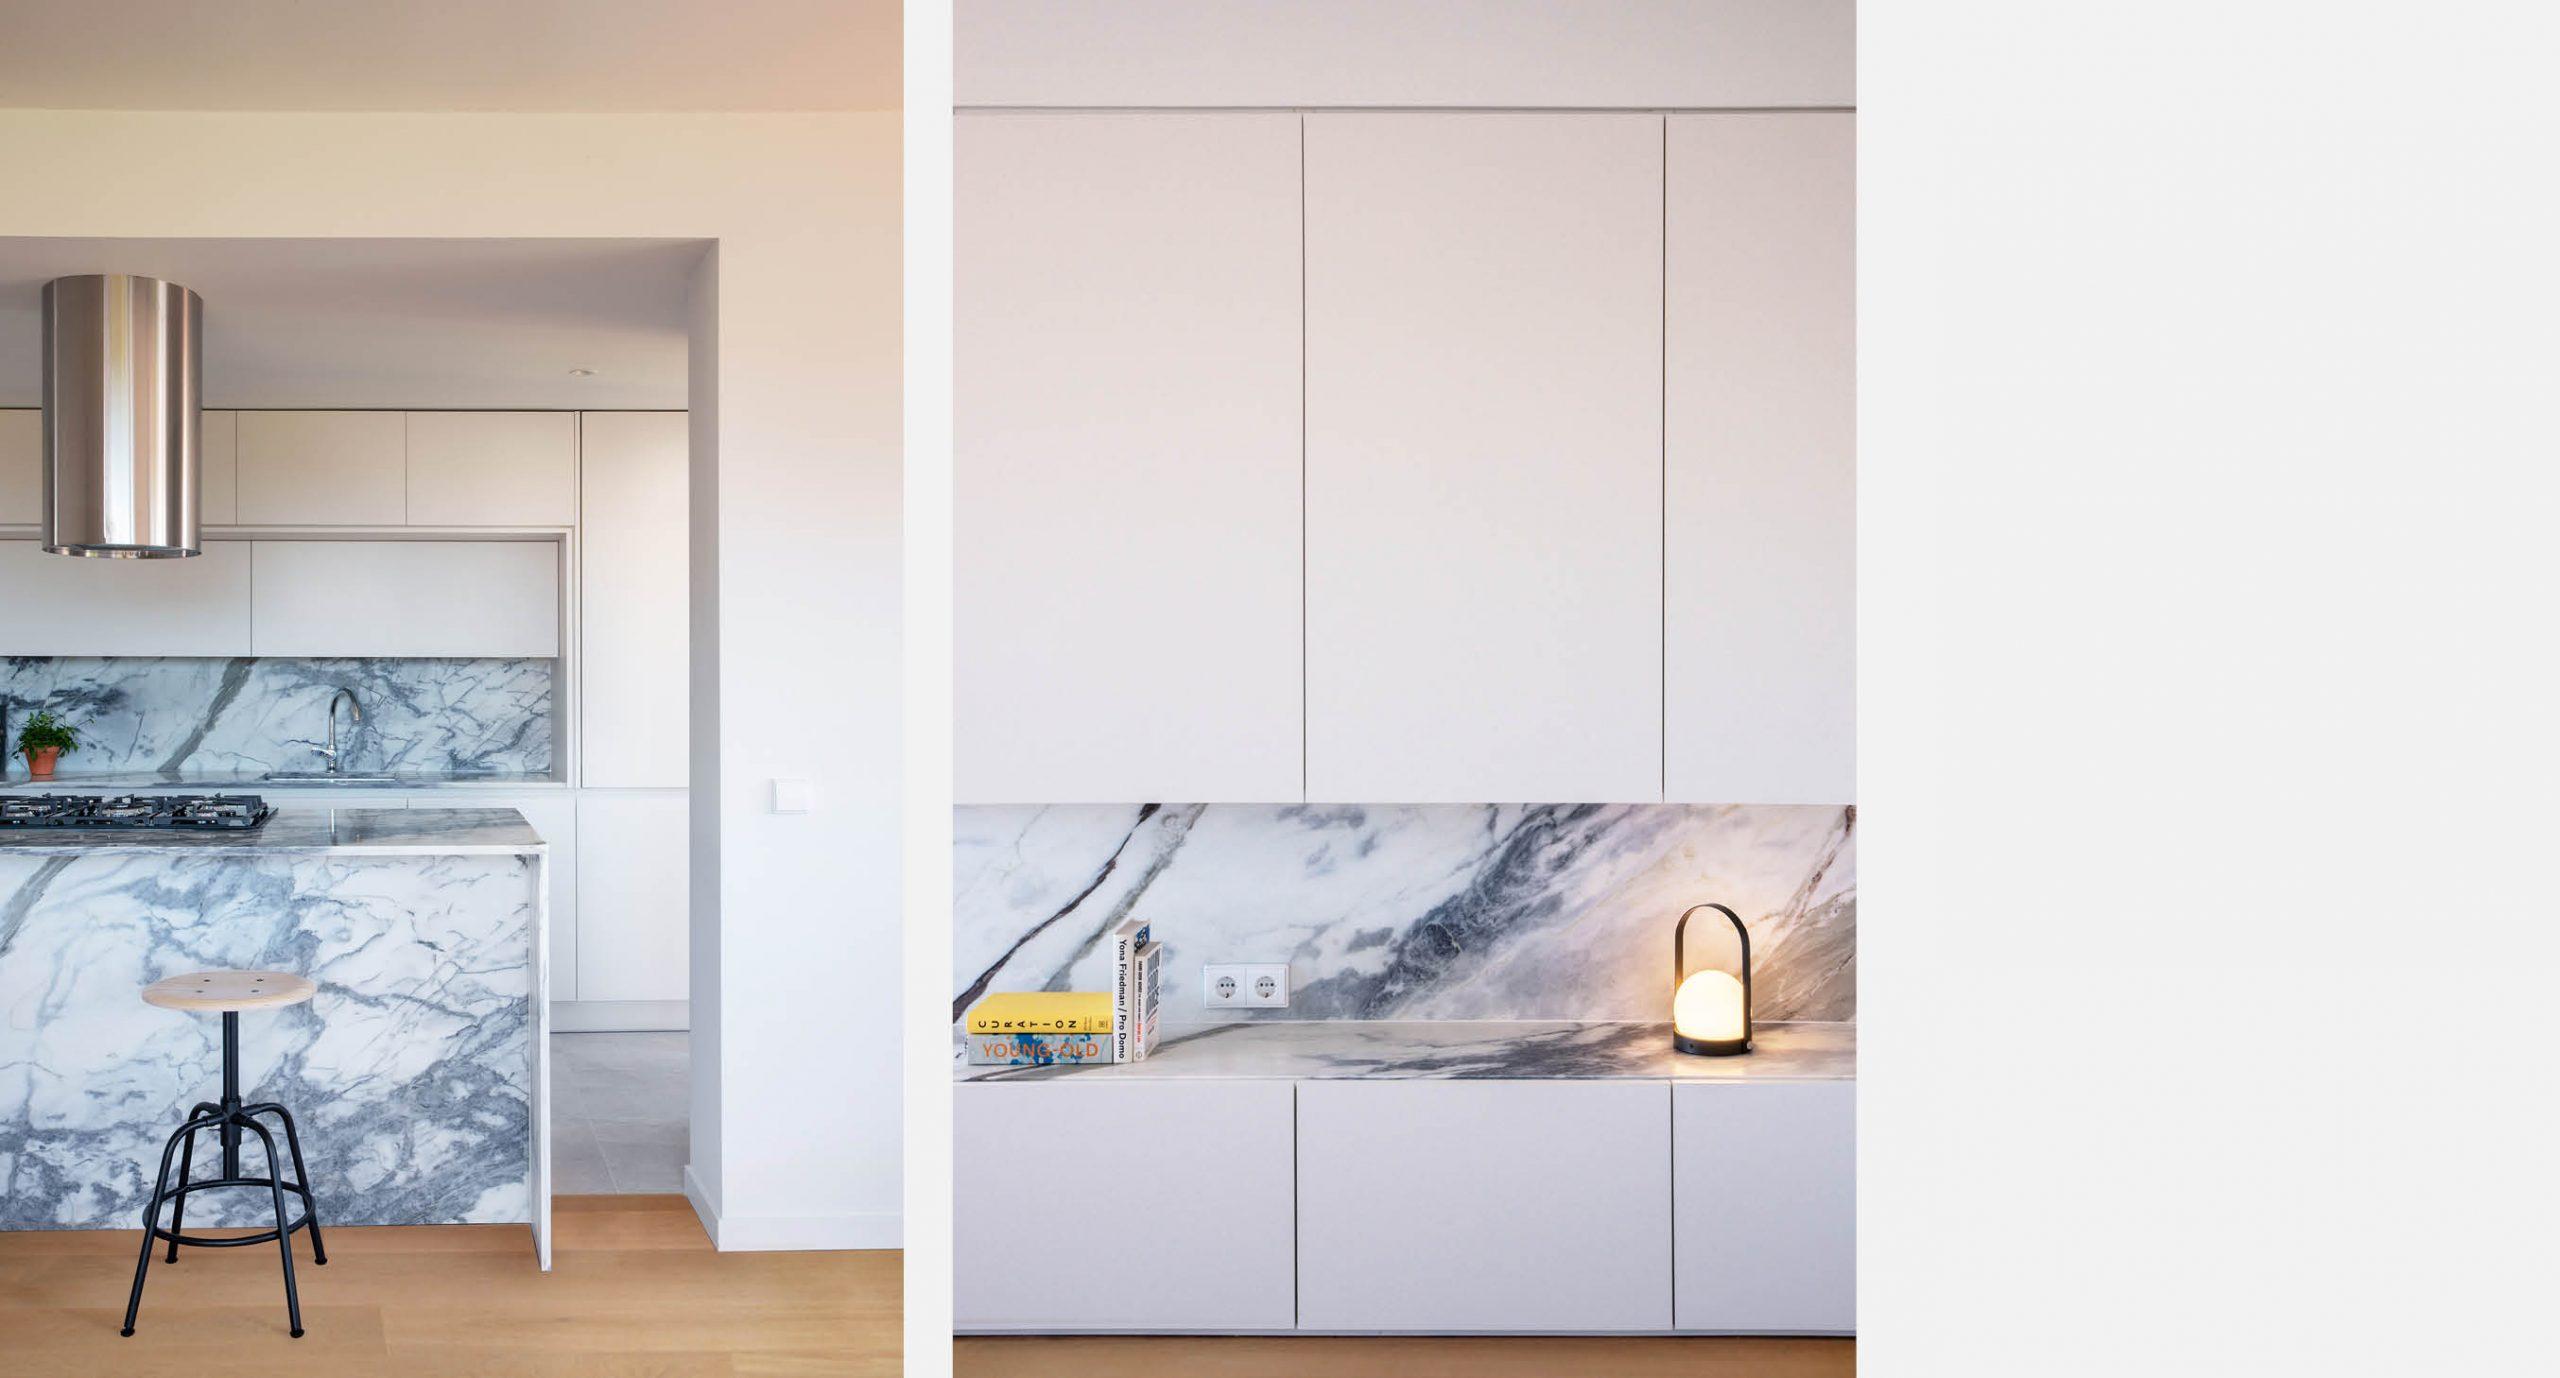 Spacegram_Parede_Apartment_Marble_Estremoz_Open_Kitchen_Detail_03